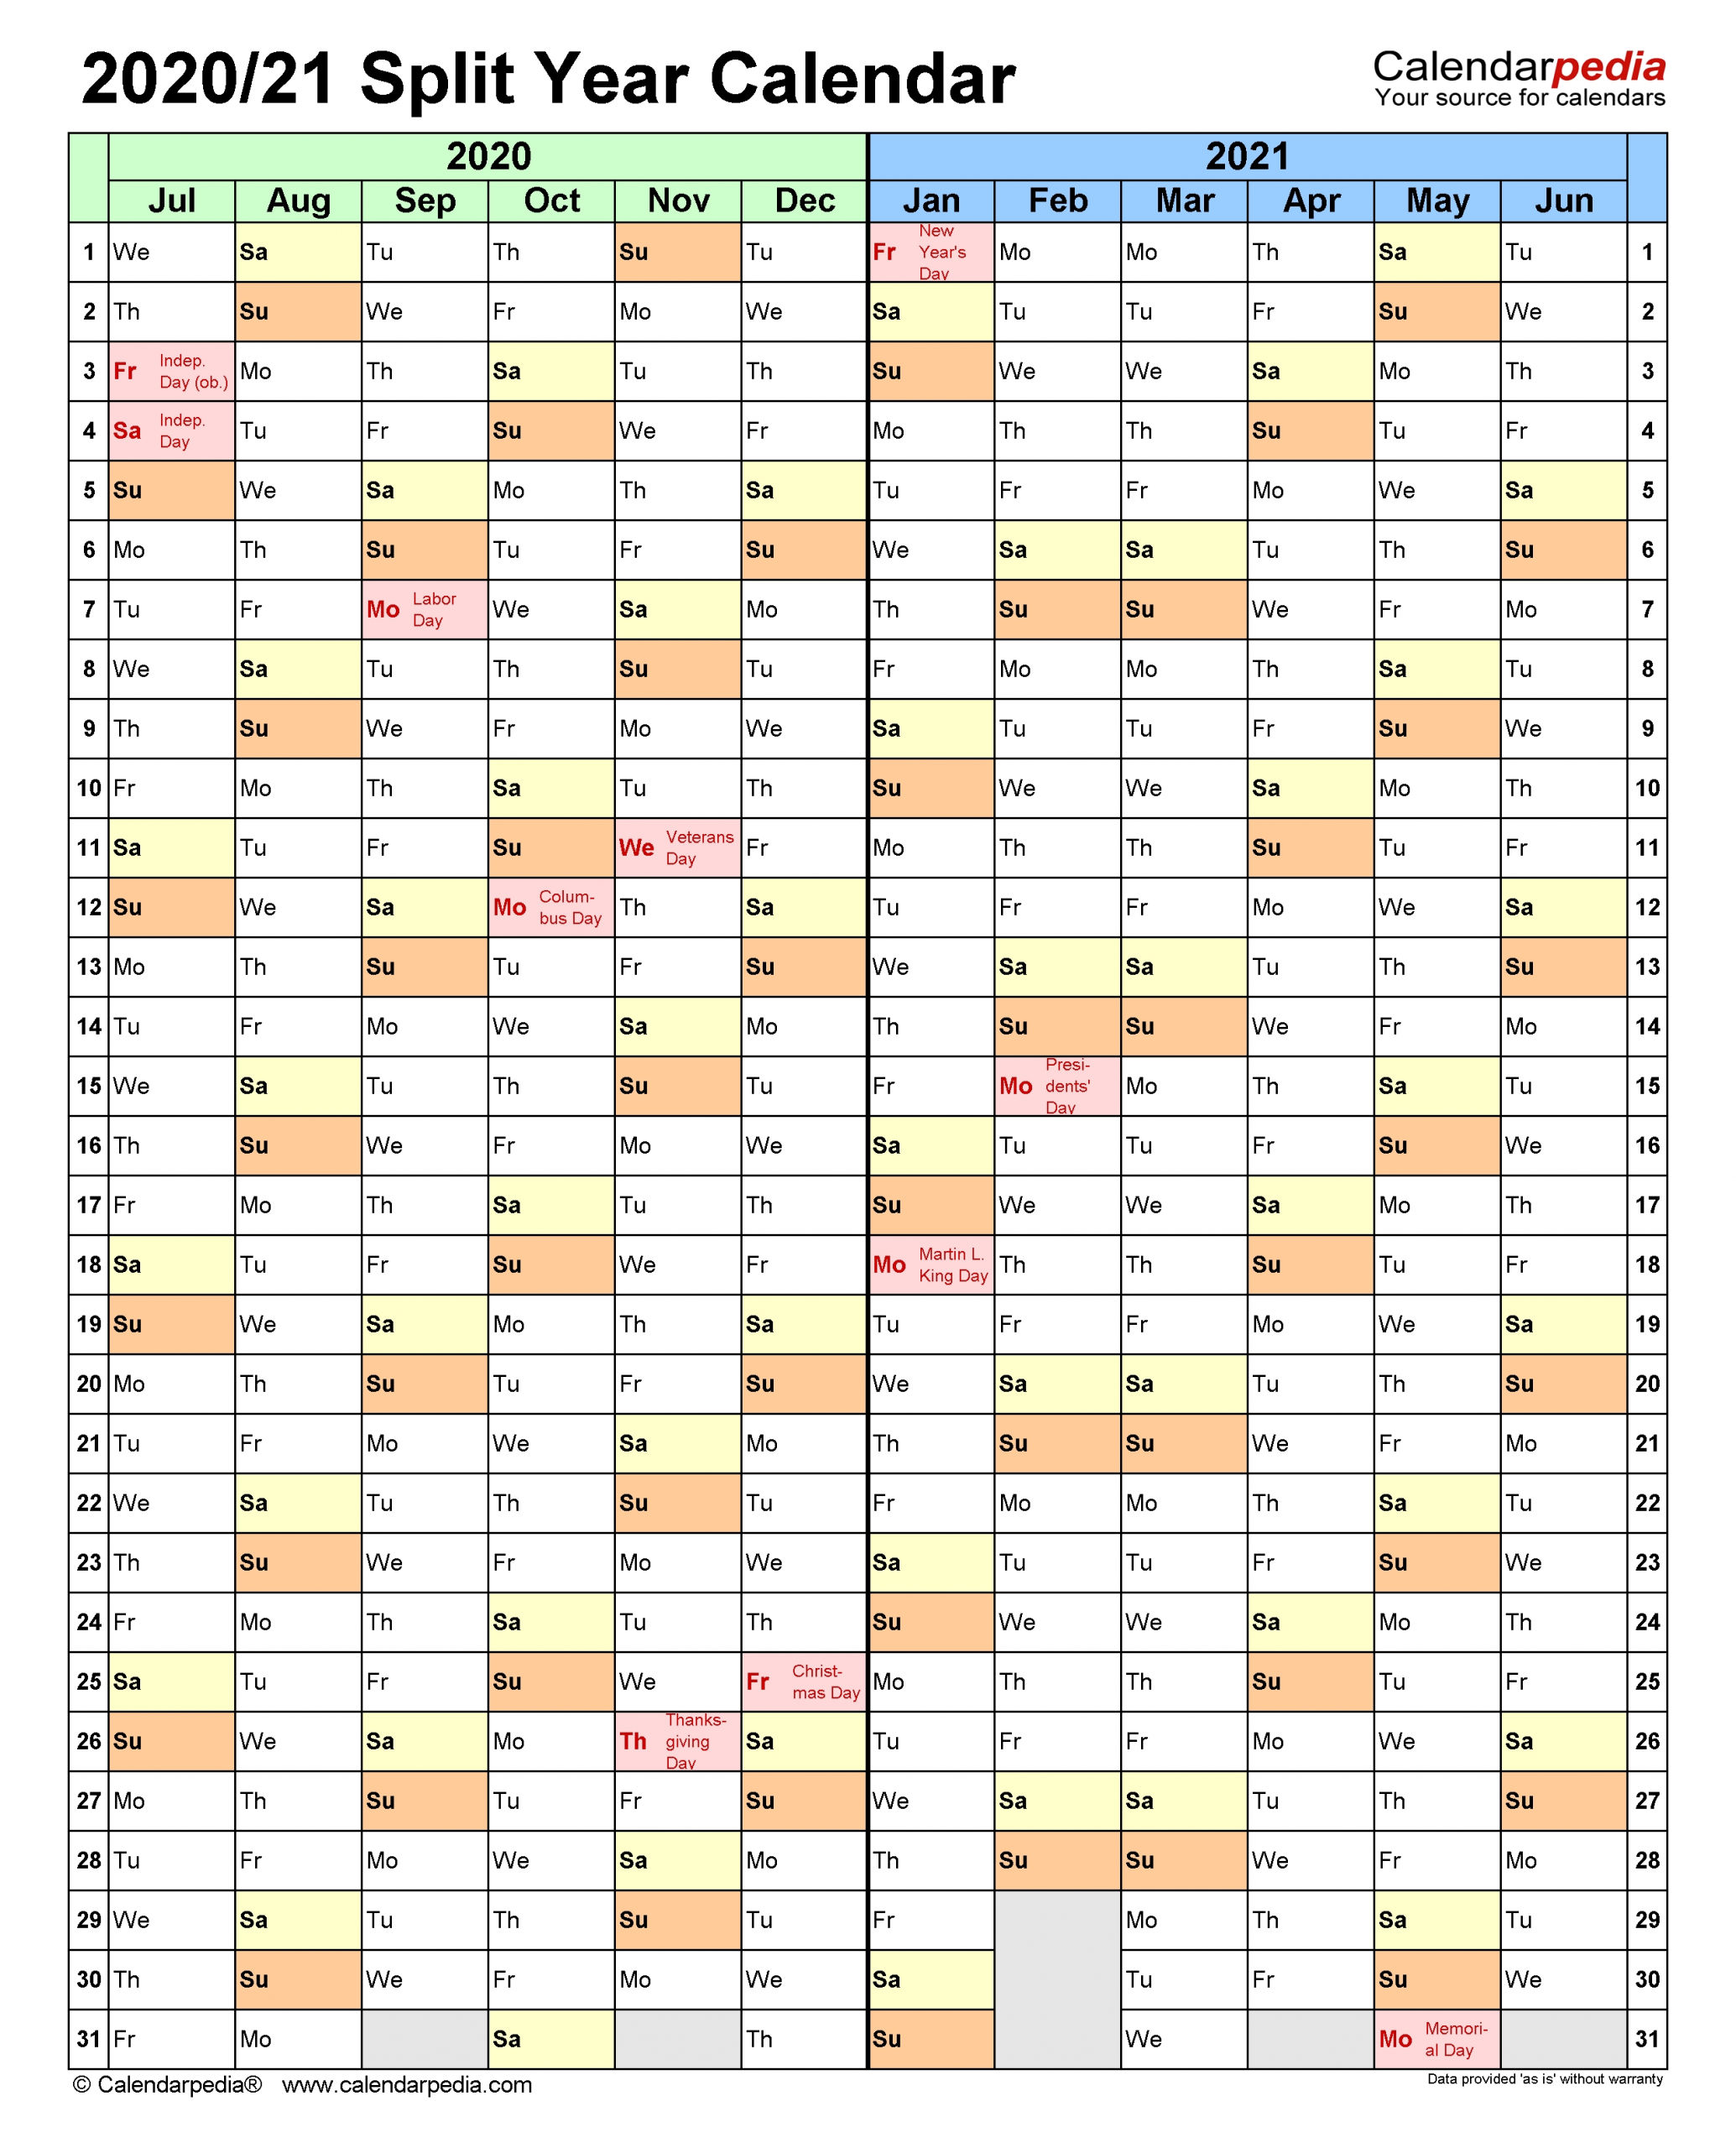 Split Year Calendars 2020/2021 (July To June) - Word Templates inside Half Page Calendars 20212